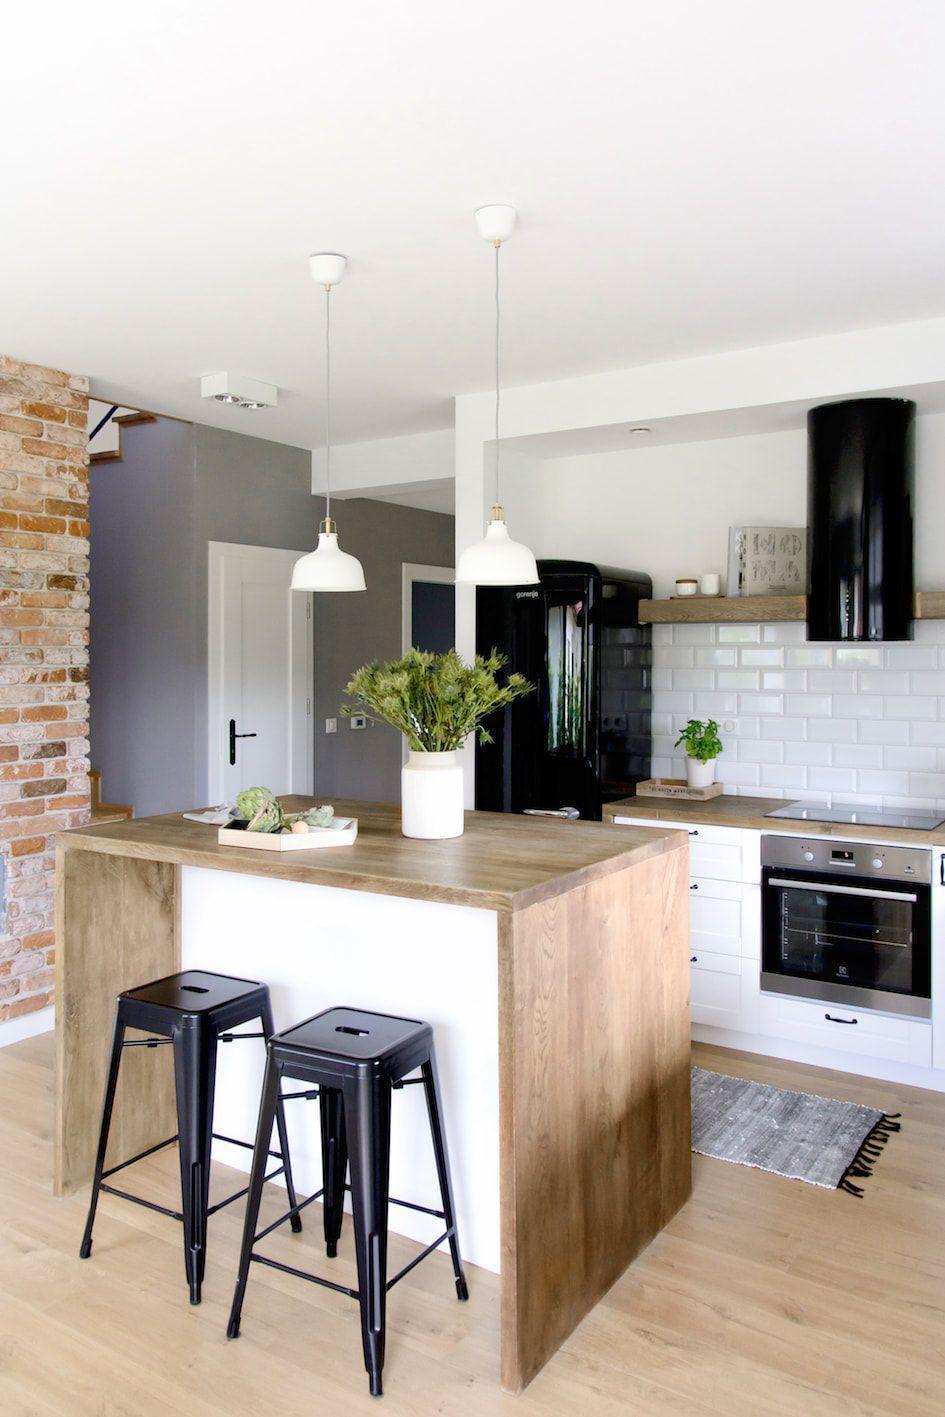 24 Genius Small Kitchen Decorating Ideas Minimalism Pinterest